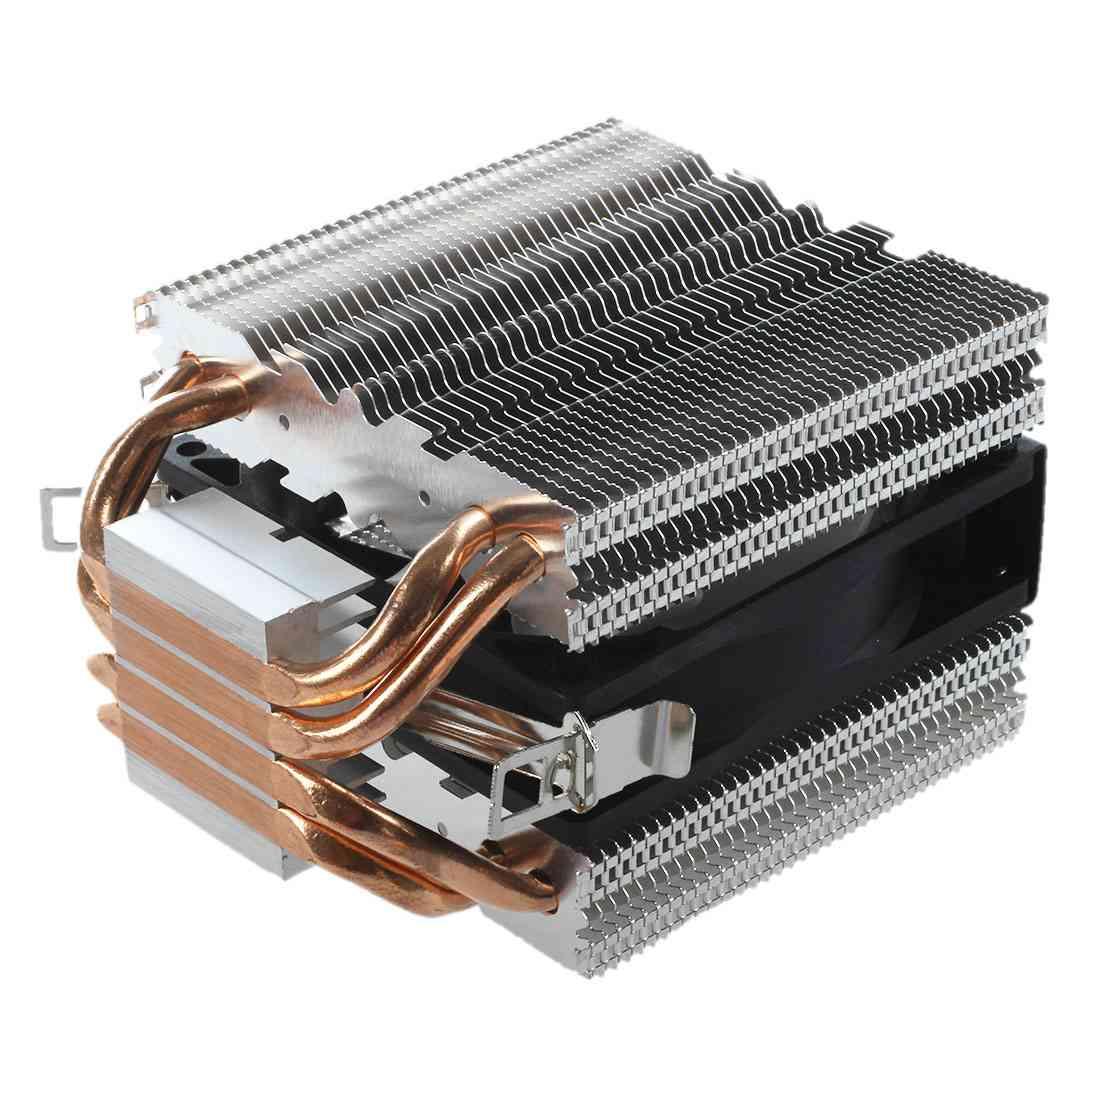 4 Heatpipe CPU Kühler Kühlkörper für Intel LGA 1150 1151 1155 775 1156 AMD Neue